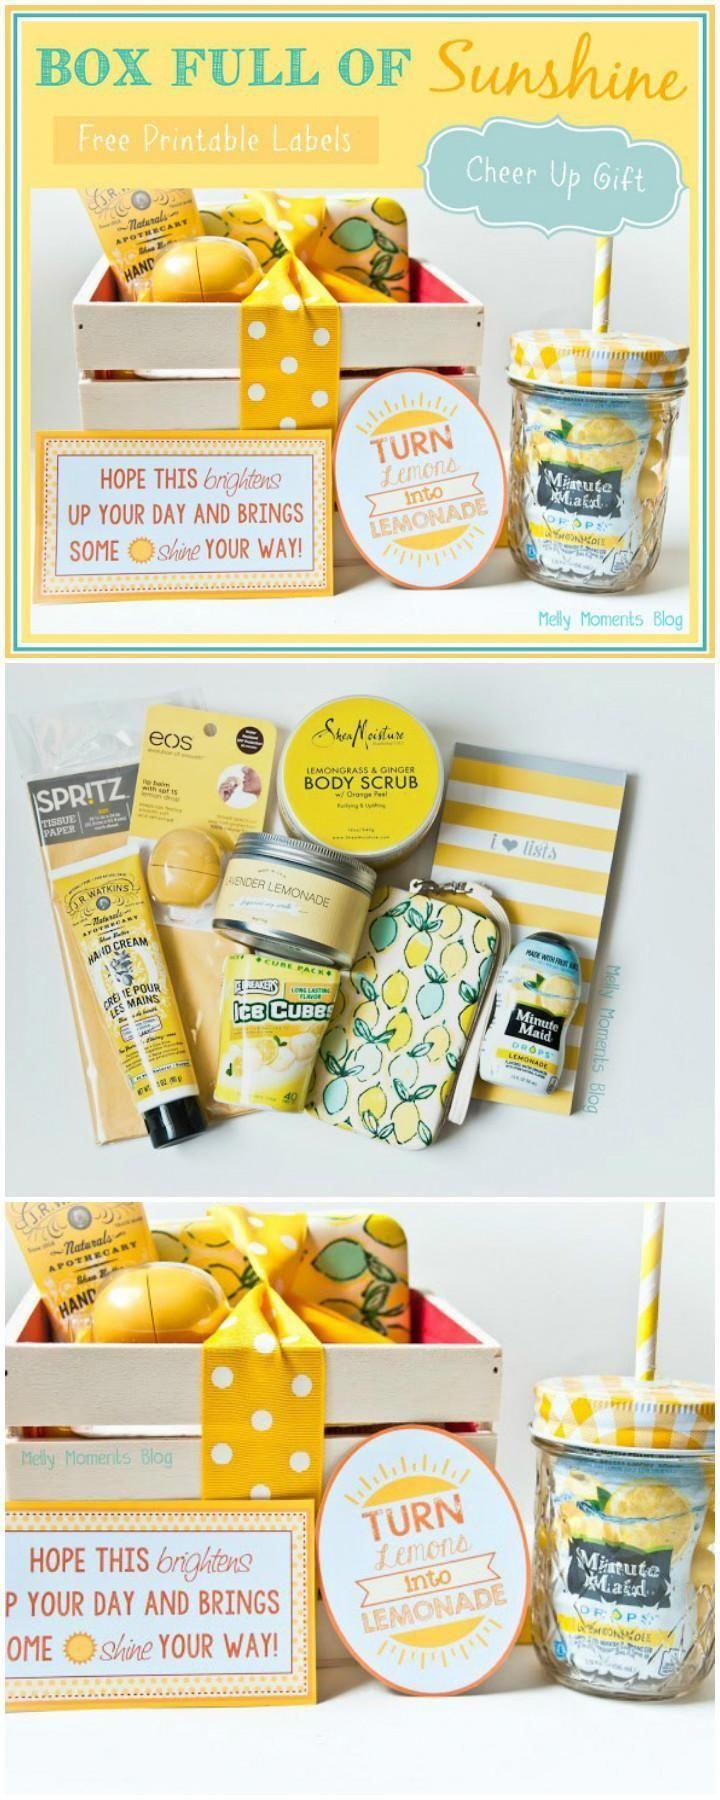 Easy Cheer Up Sunshine Gift Basket - 70+ Inexpensive DIY Gift Basket Ideas - DIY Gifts - DIY & Crafts #uniquechristmasgiftsforkids #boyfriendgiftbasket